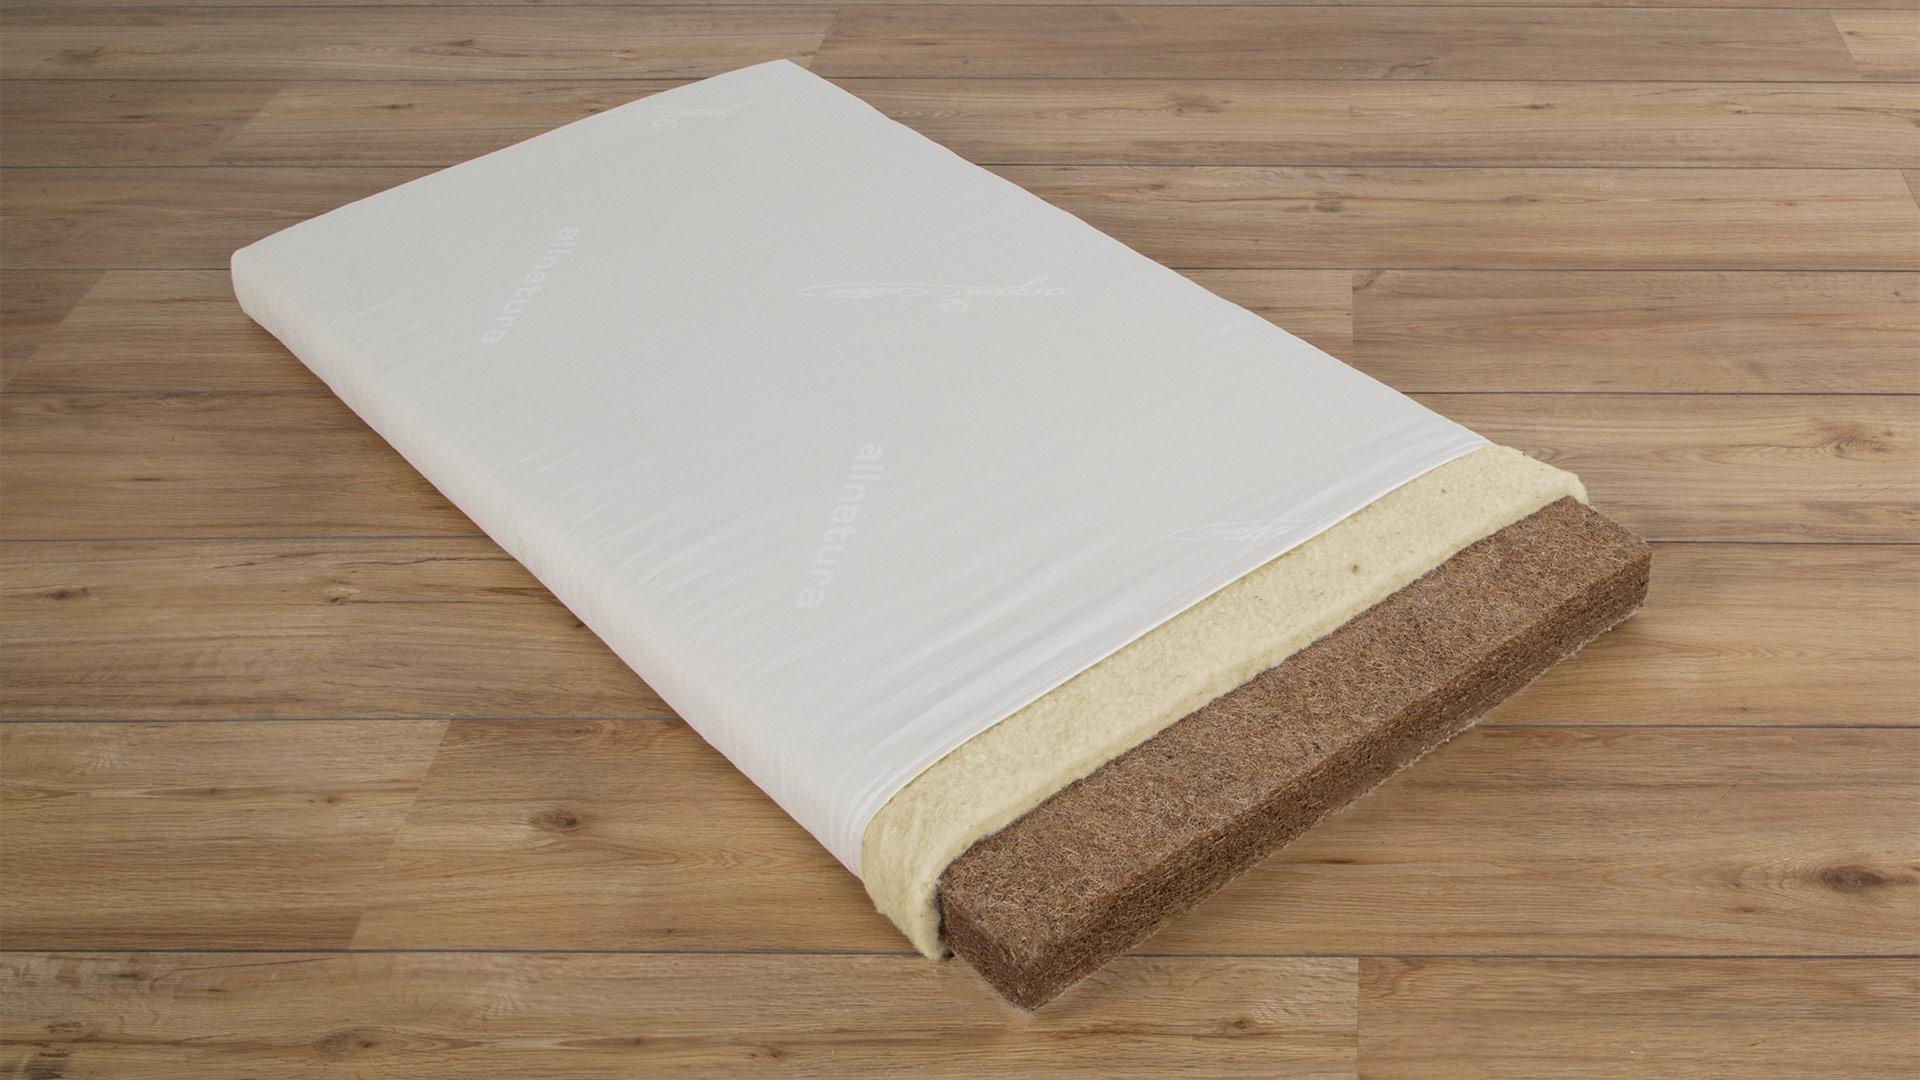 Matratze test frisch matratzen schlaraffia matratzen test